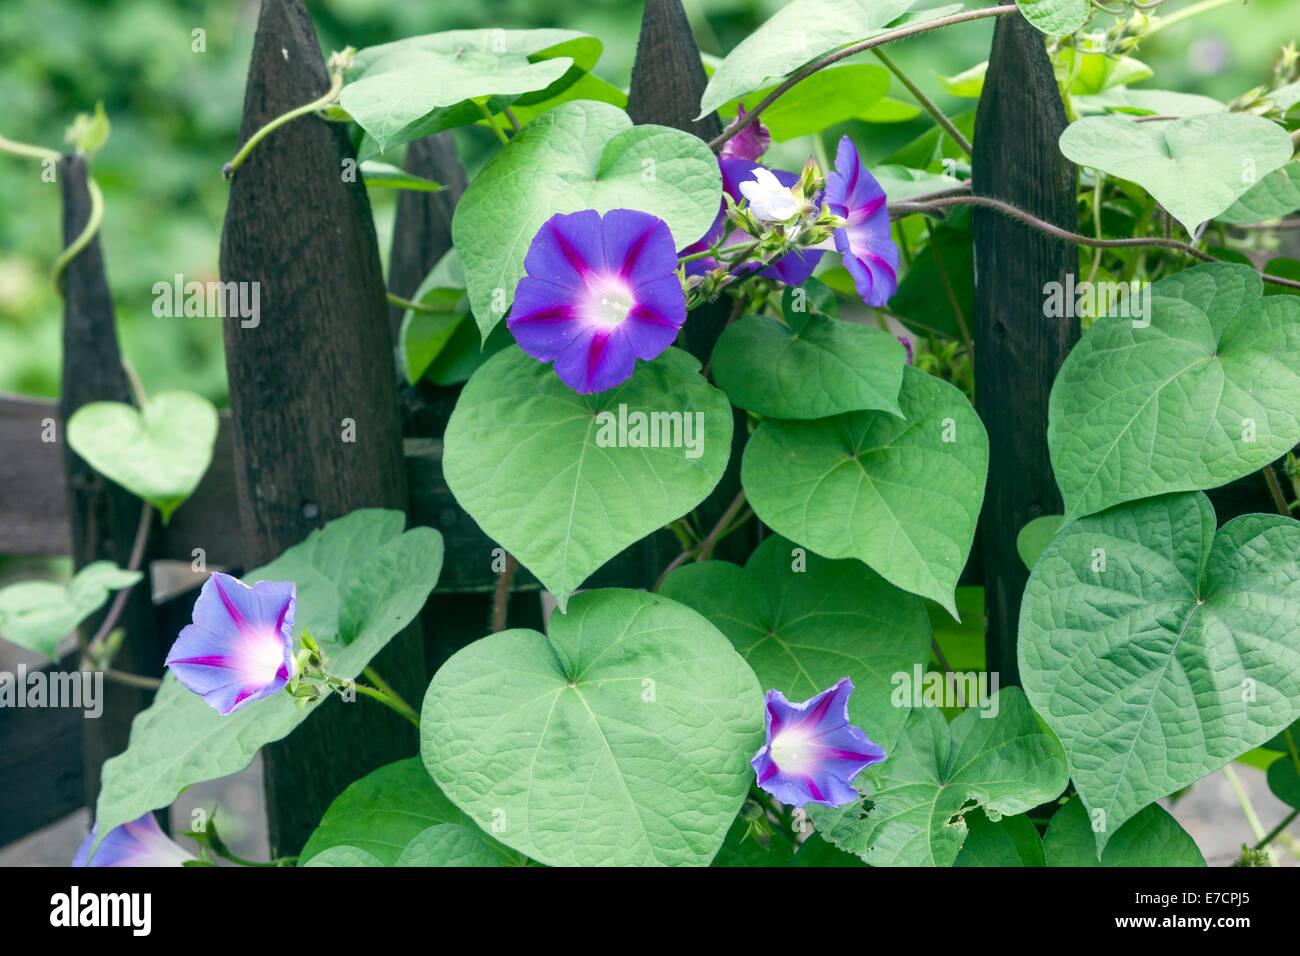 Morning Glory, Ipomoea purpurea - Stock Image